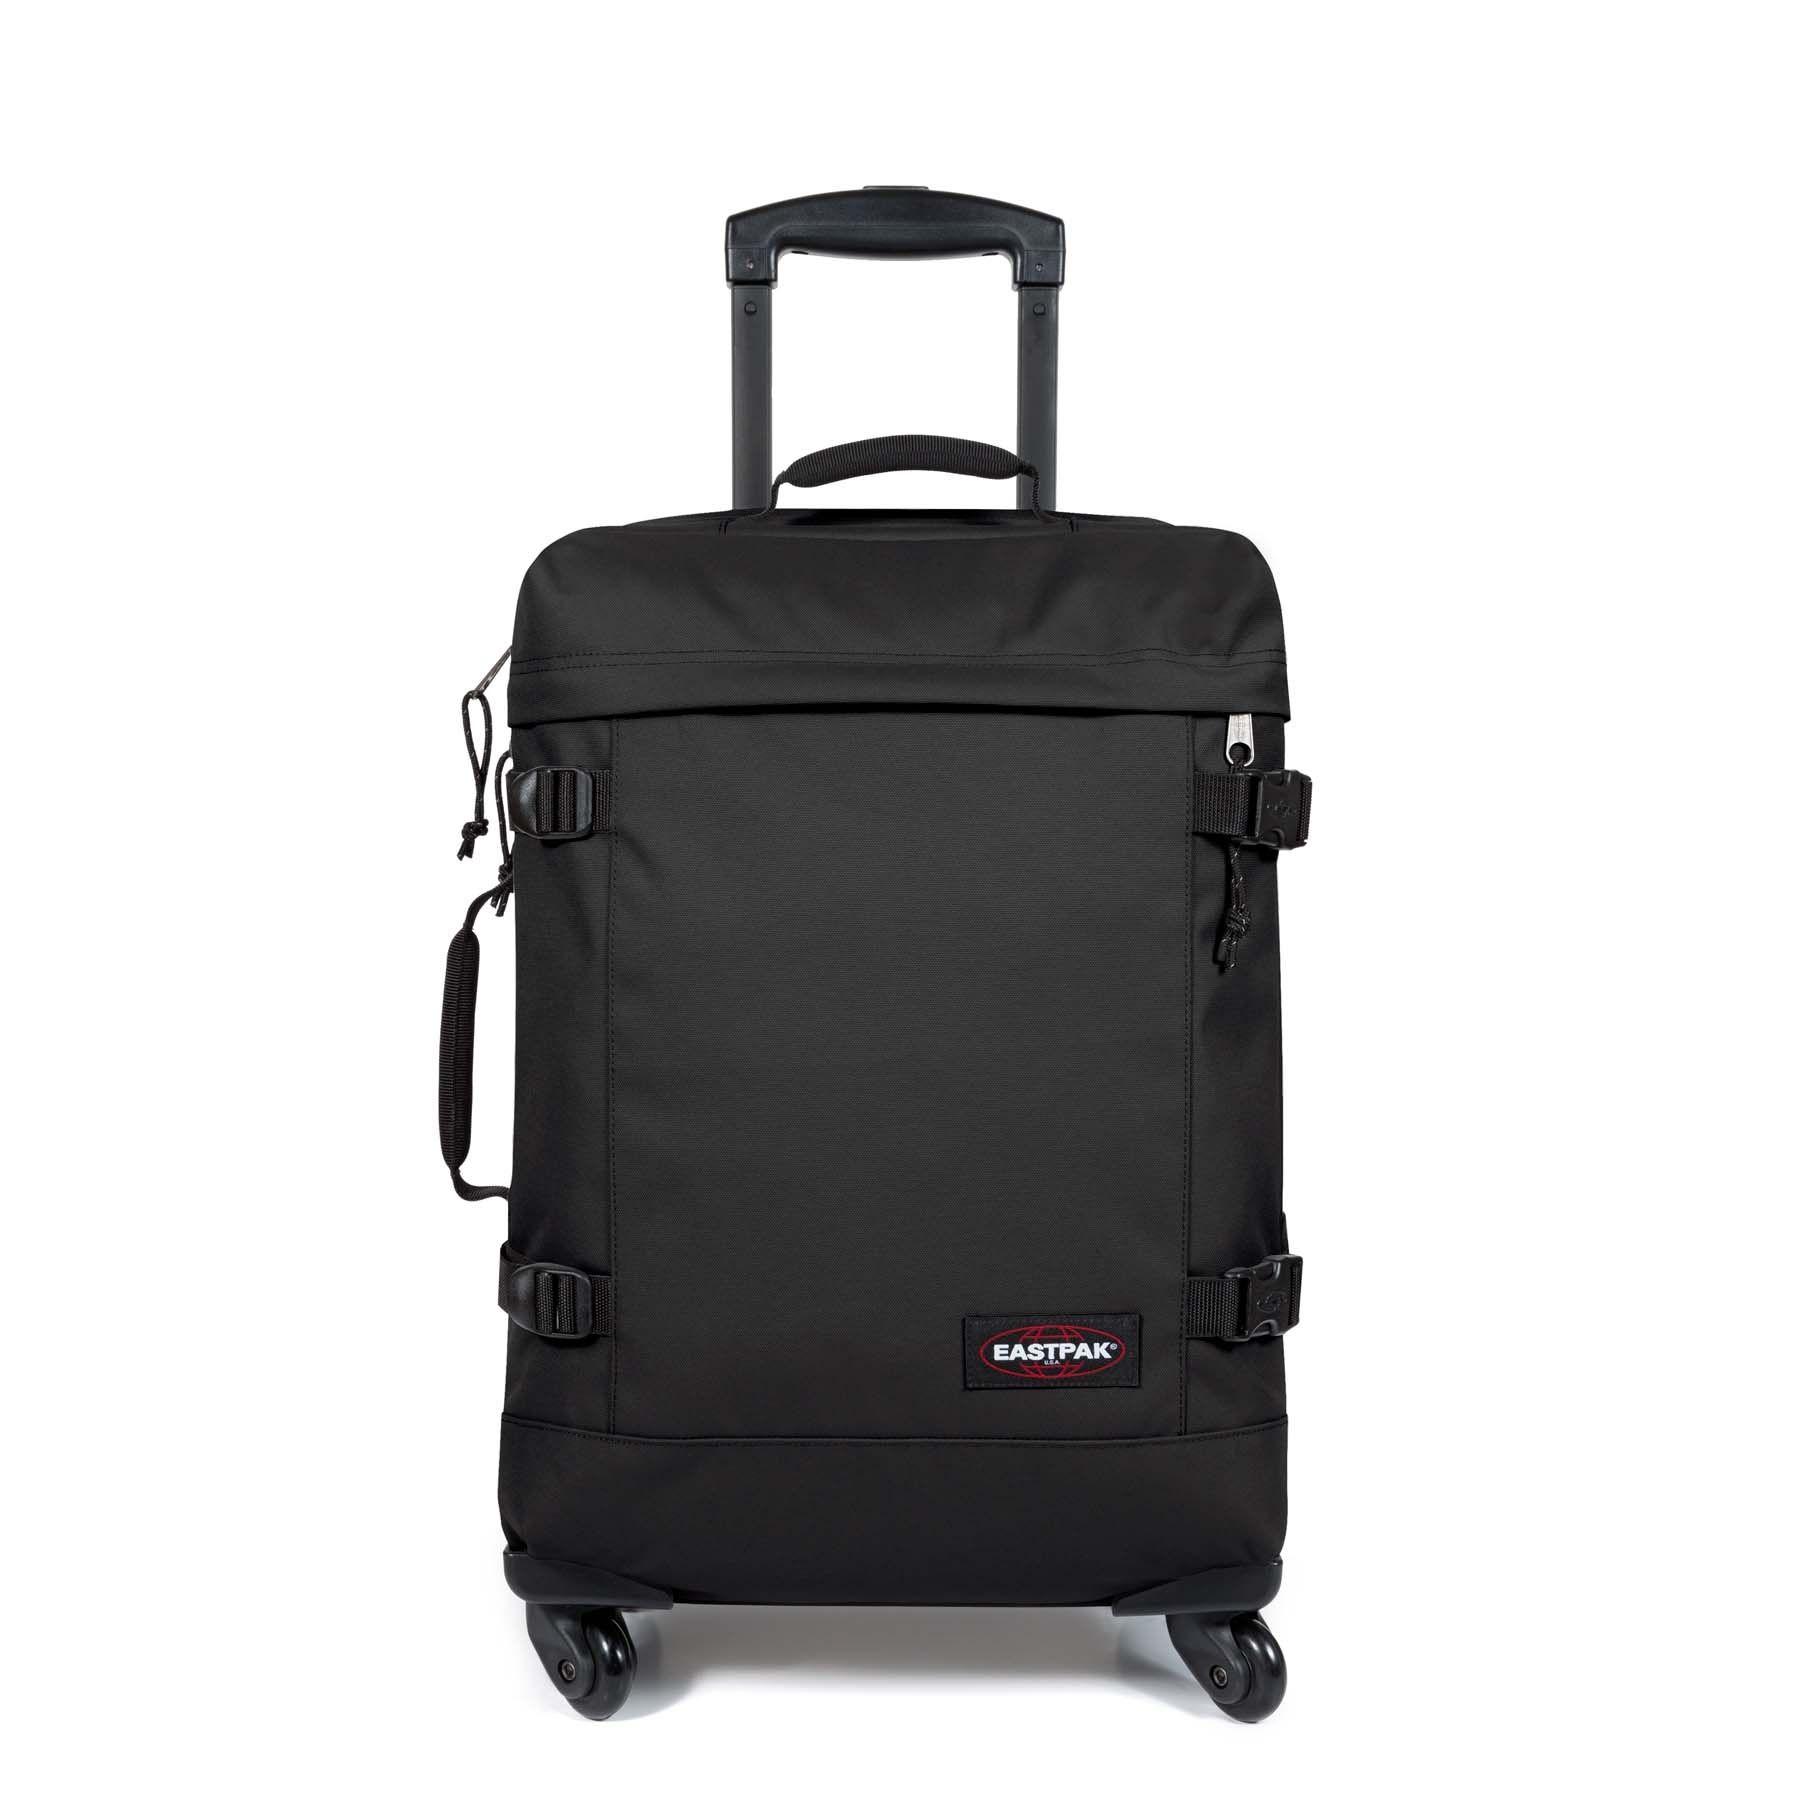 trans4 s cabin case EASTPAK   EK80L008